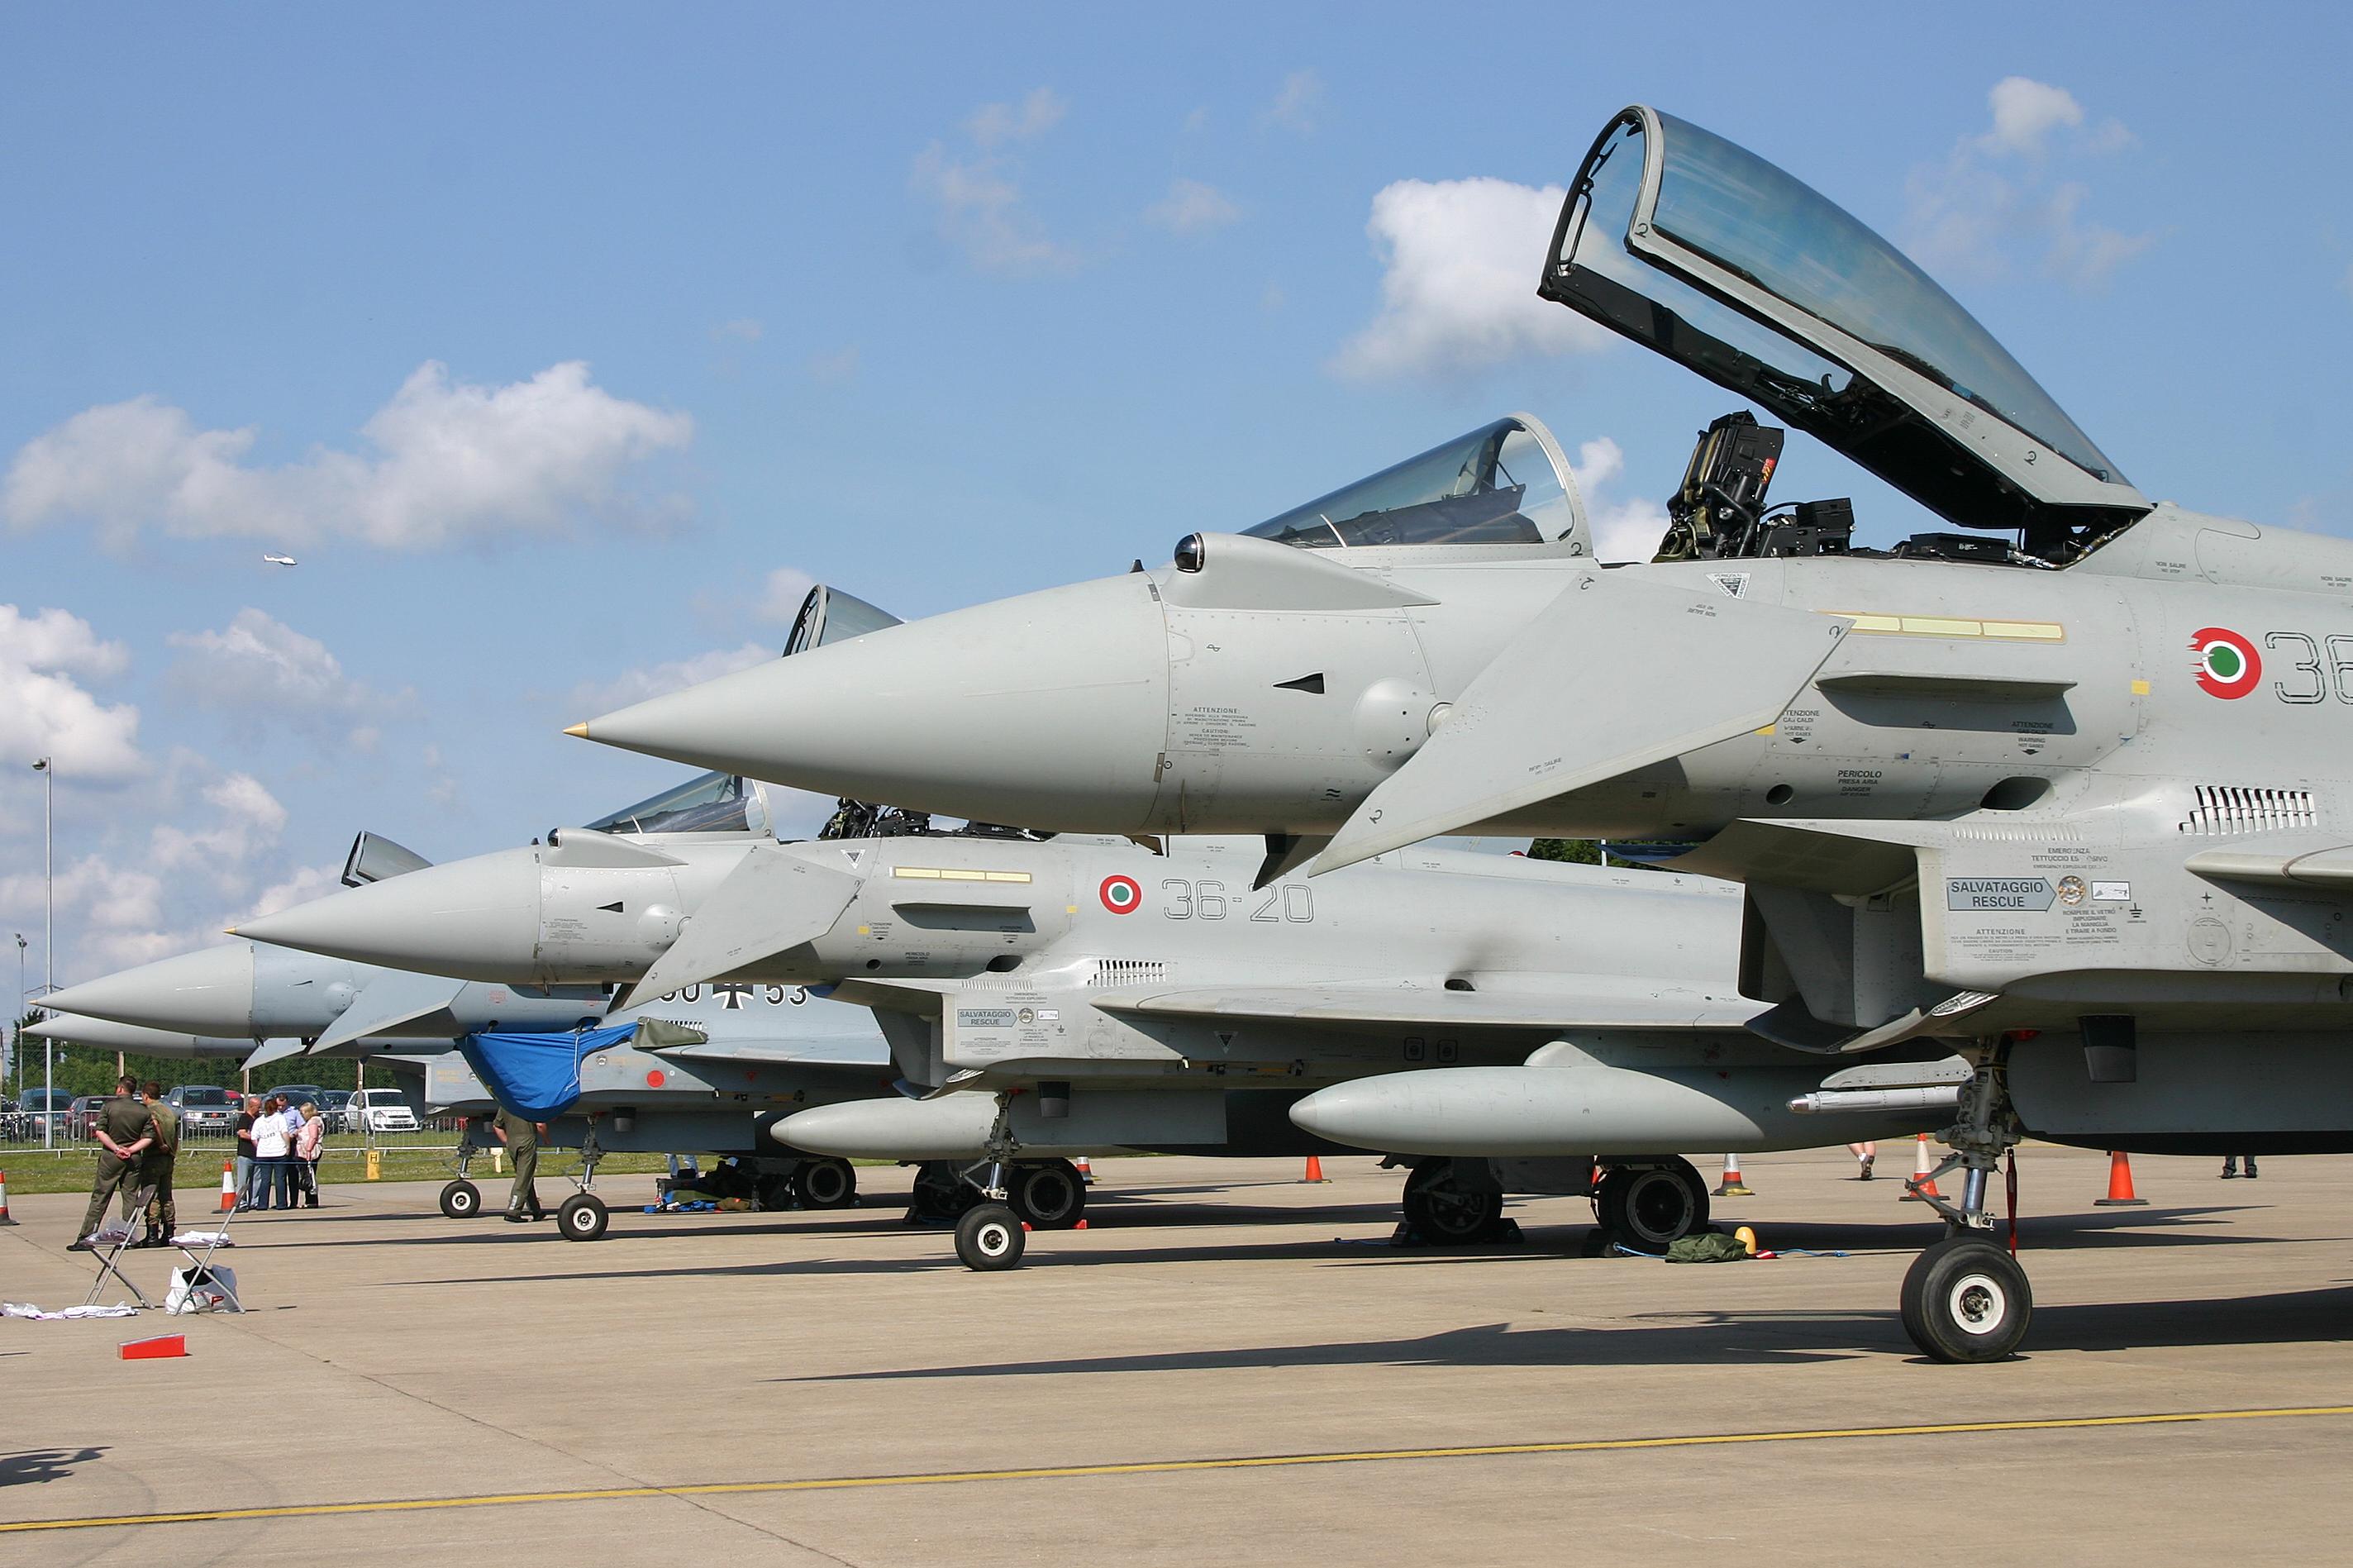 File:Eurofighter Typhoon line up (6204931101).jpg - Wikimedia Commons